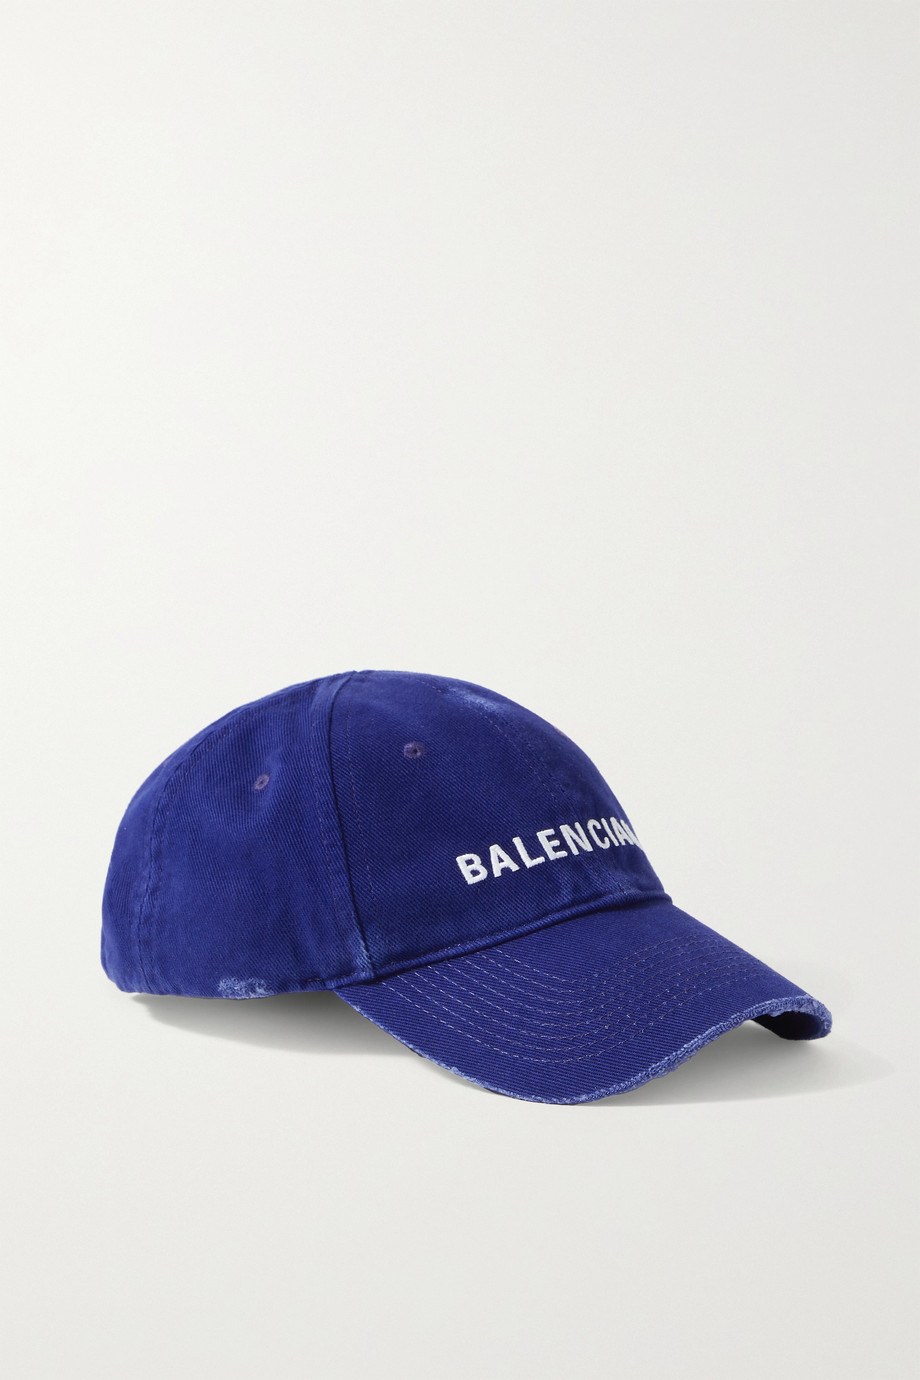 Balenciaga Baseballkappe aus Baumwoll-Twill mit Stickerei